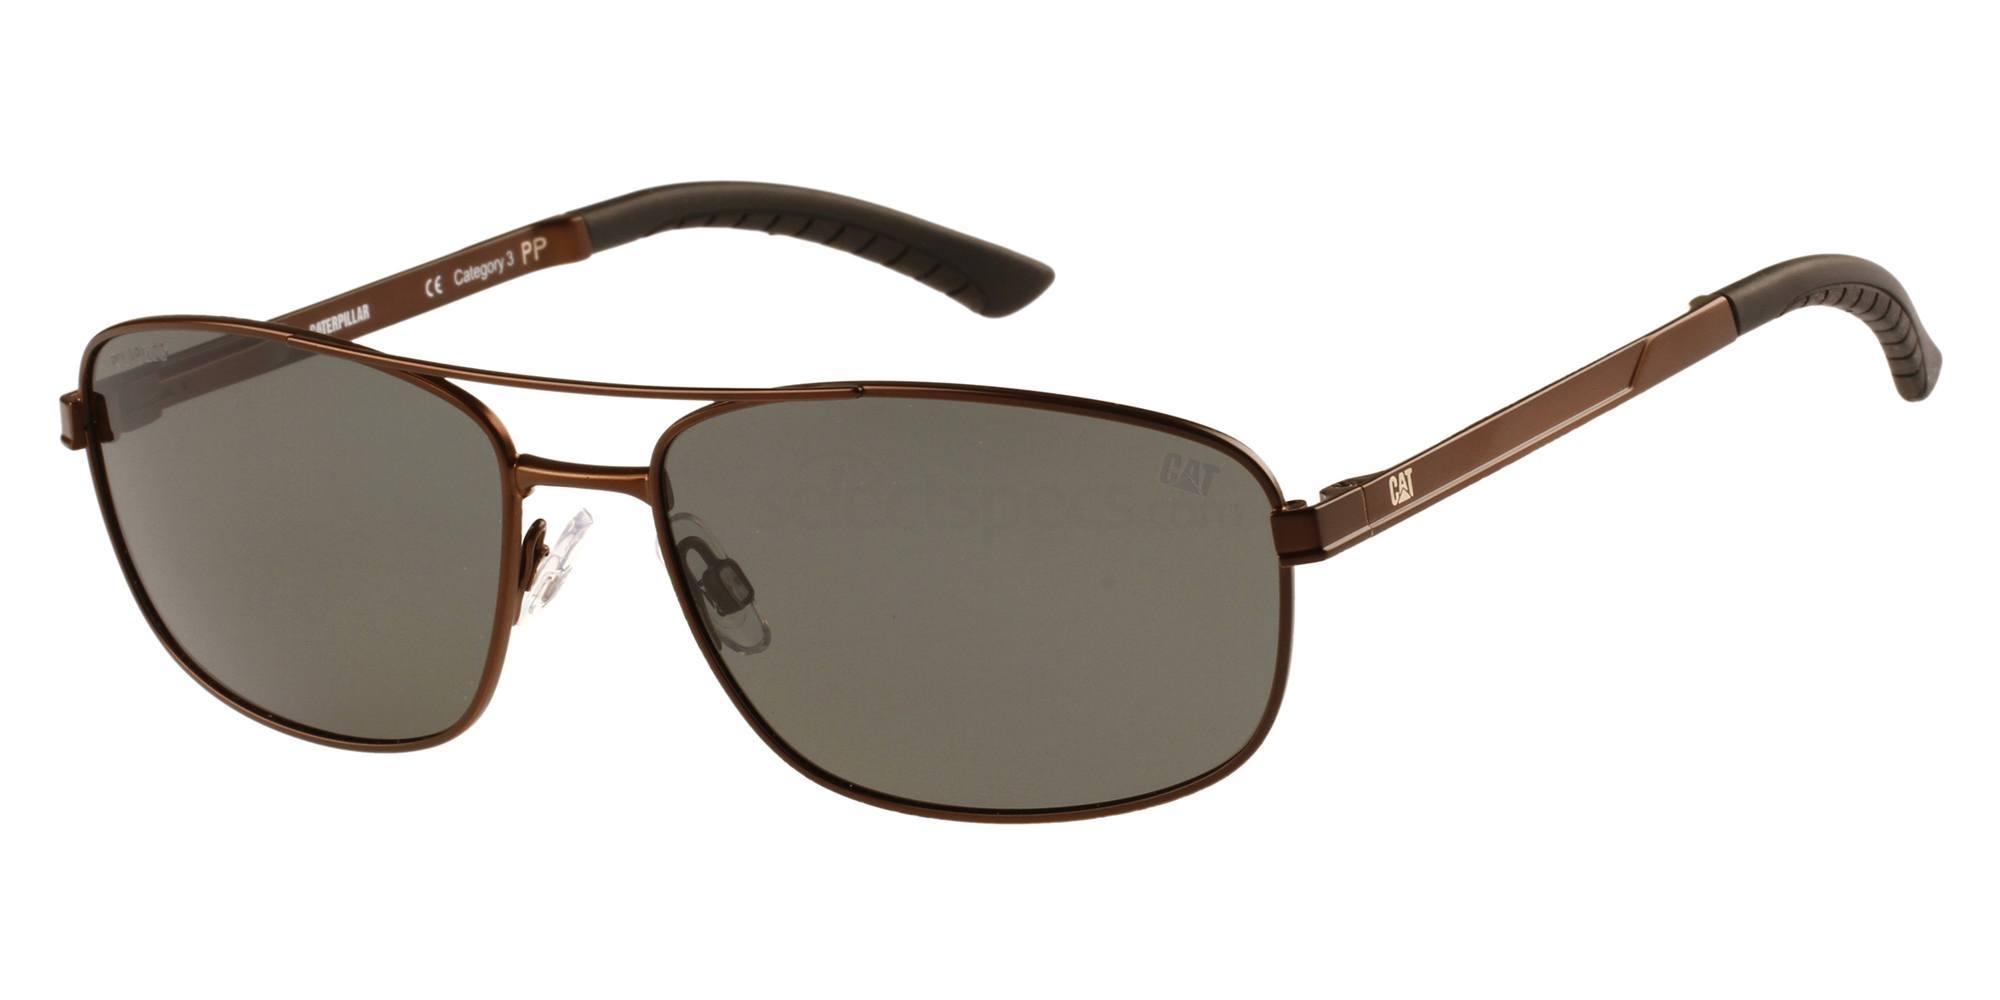 003P CTS-1507-P Sunglasses, CAT